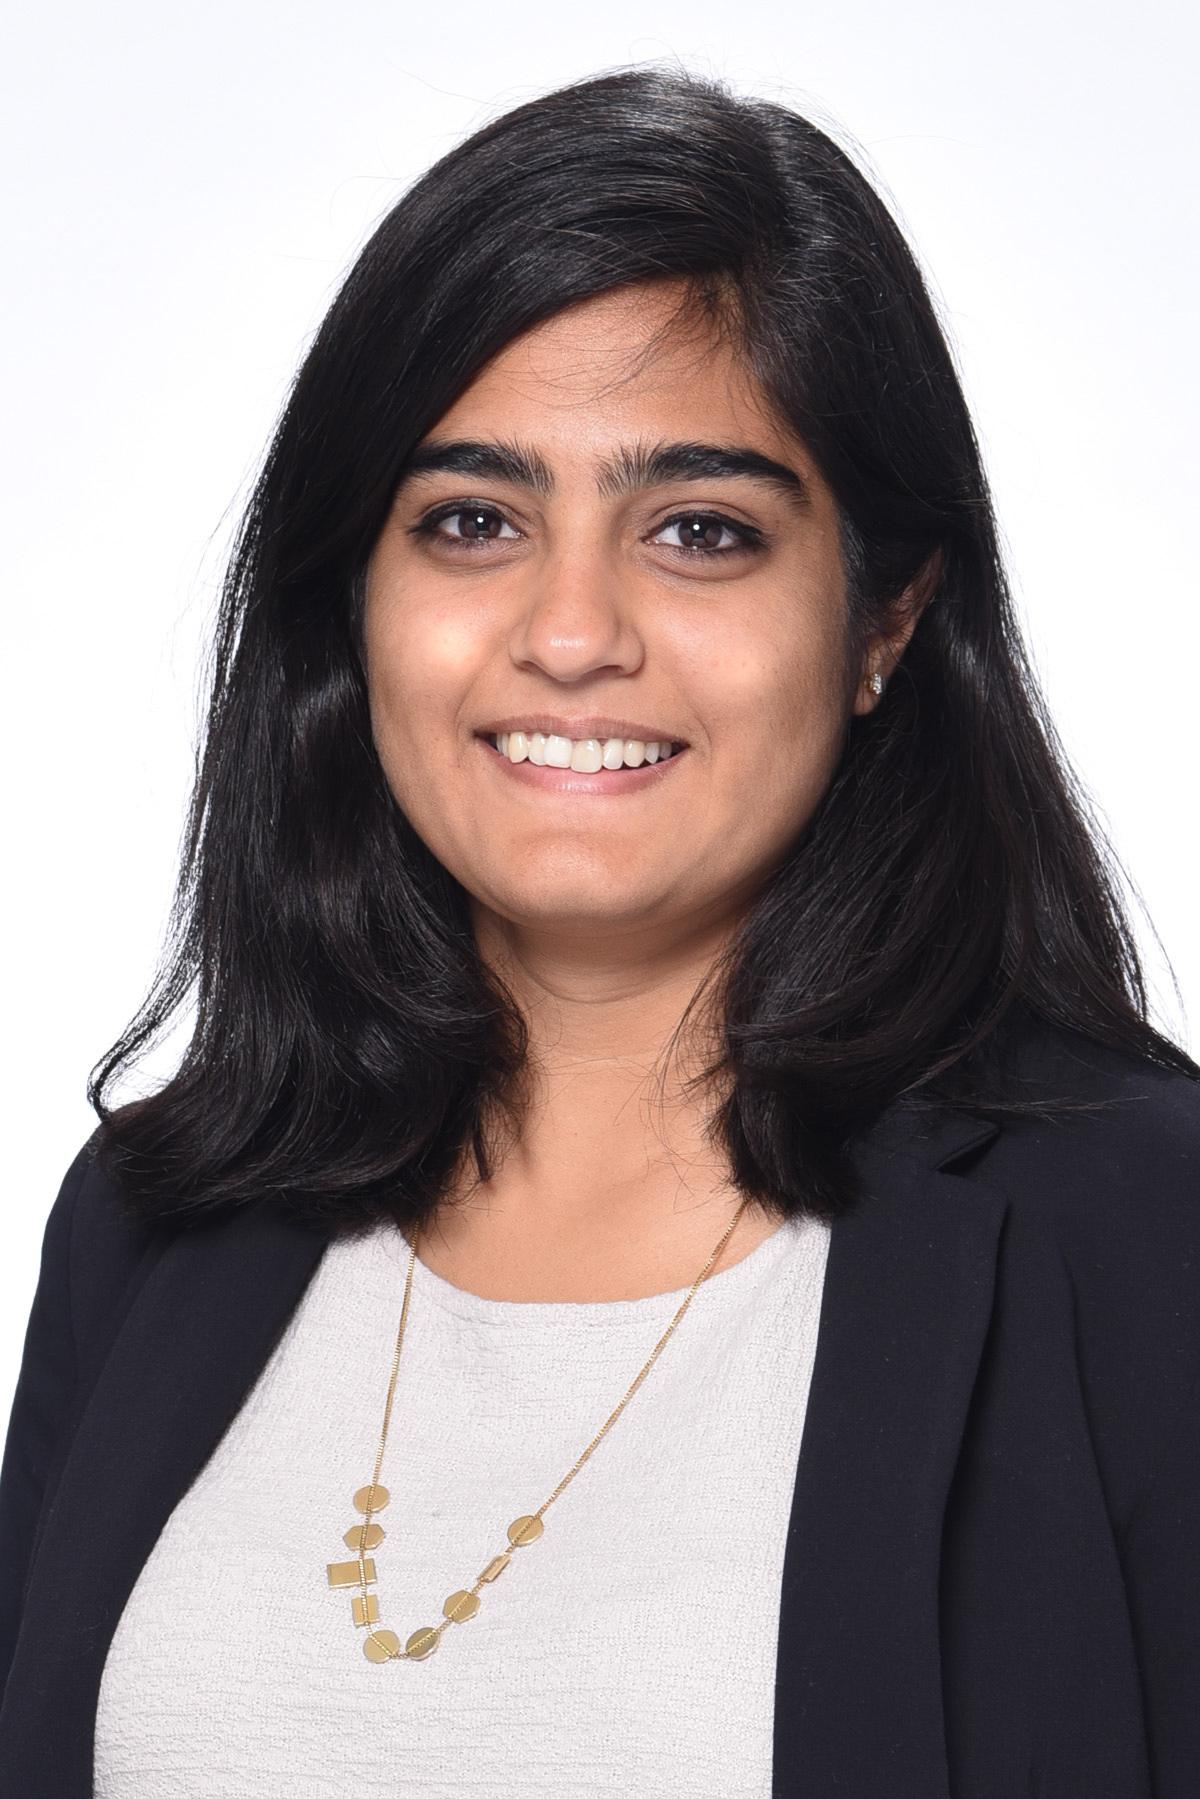 Krithika Narayan, Class of 2020